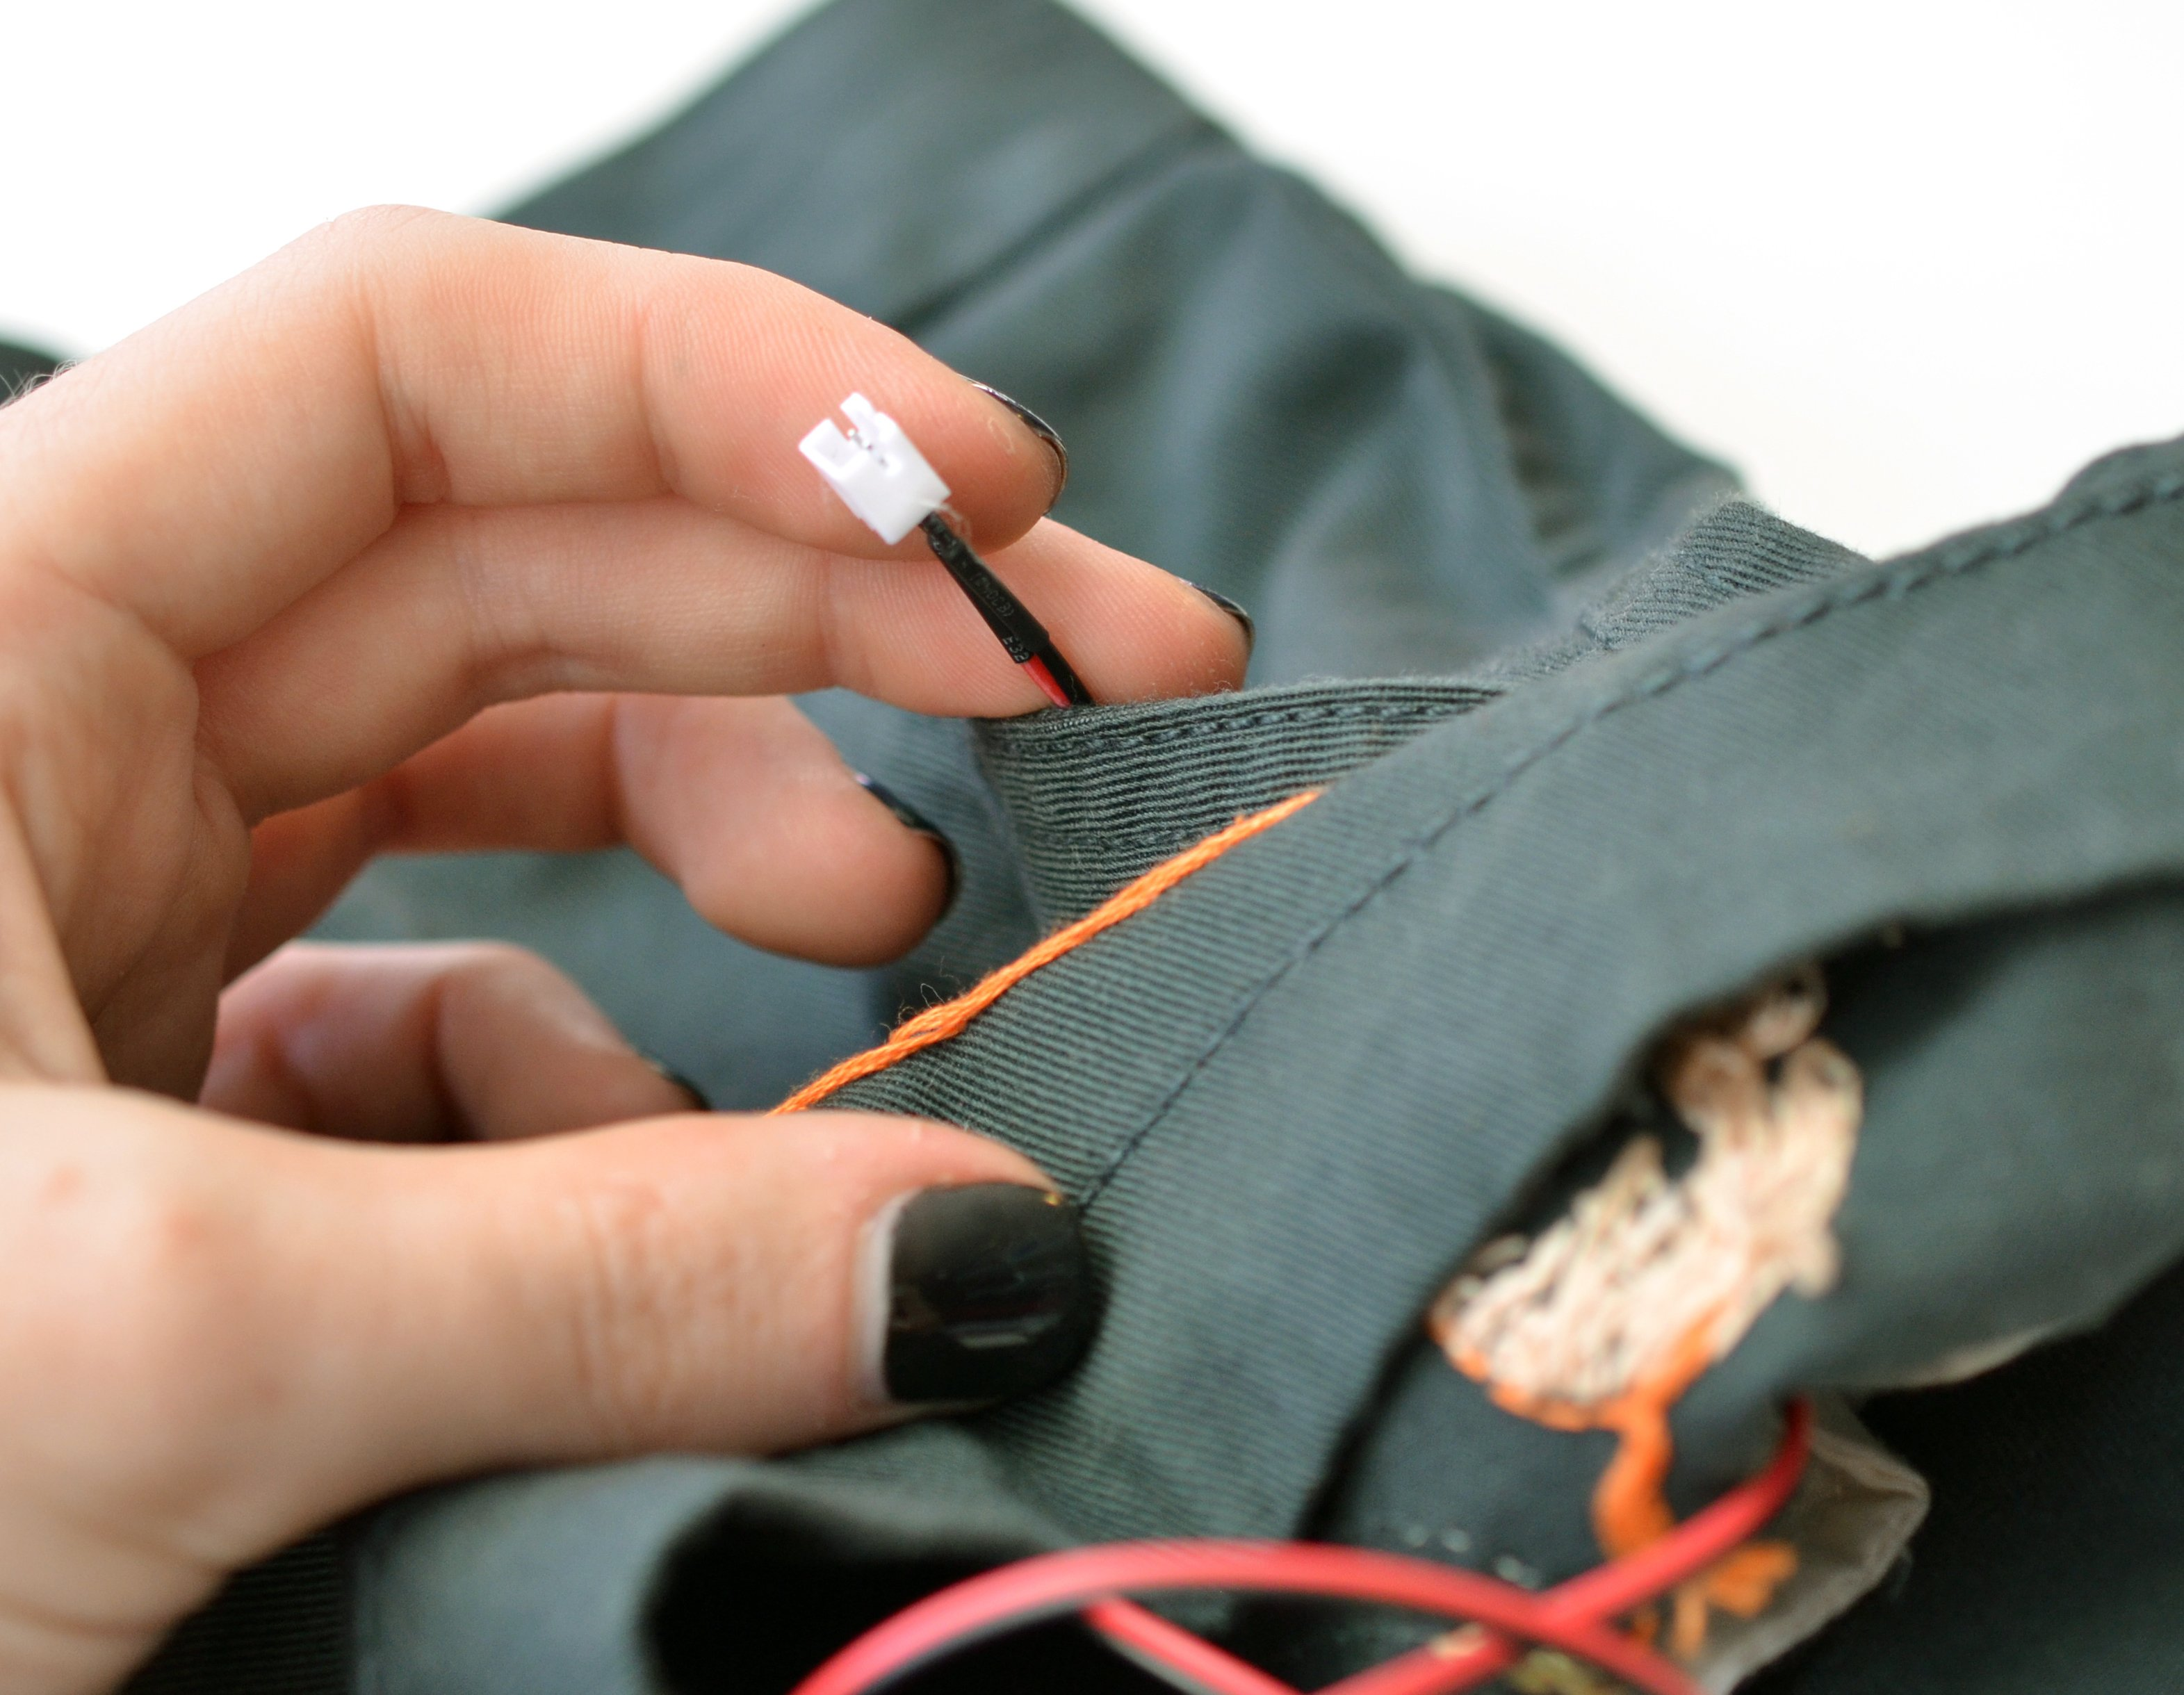 flora-angler-embroidery-31.jpg